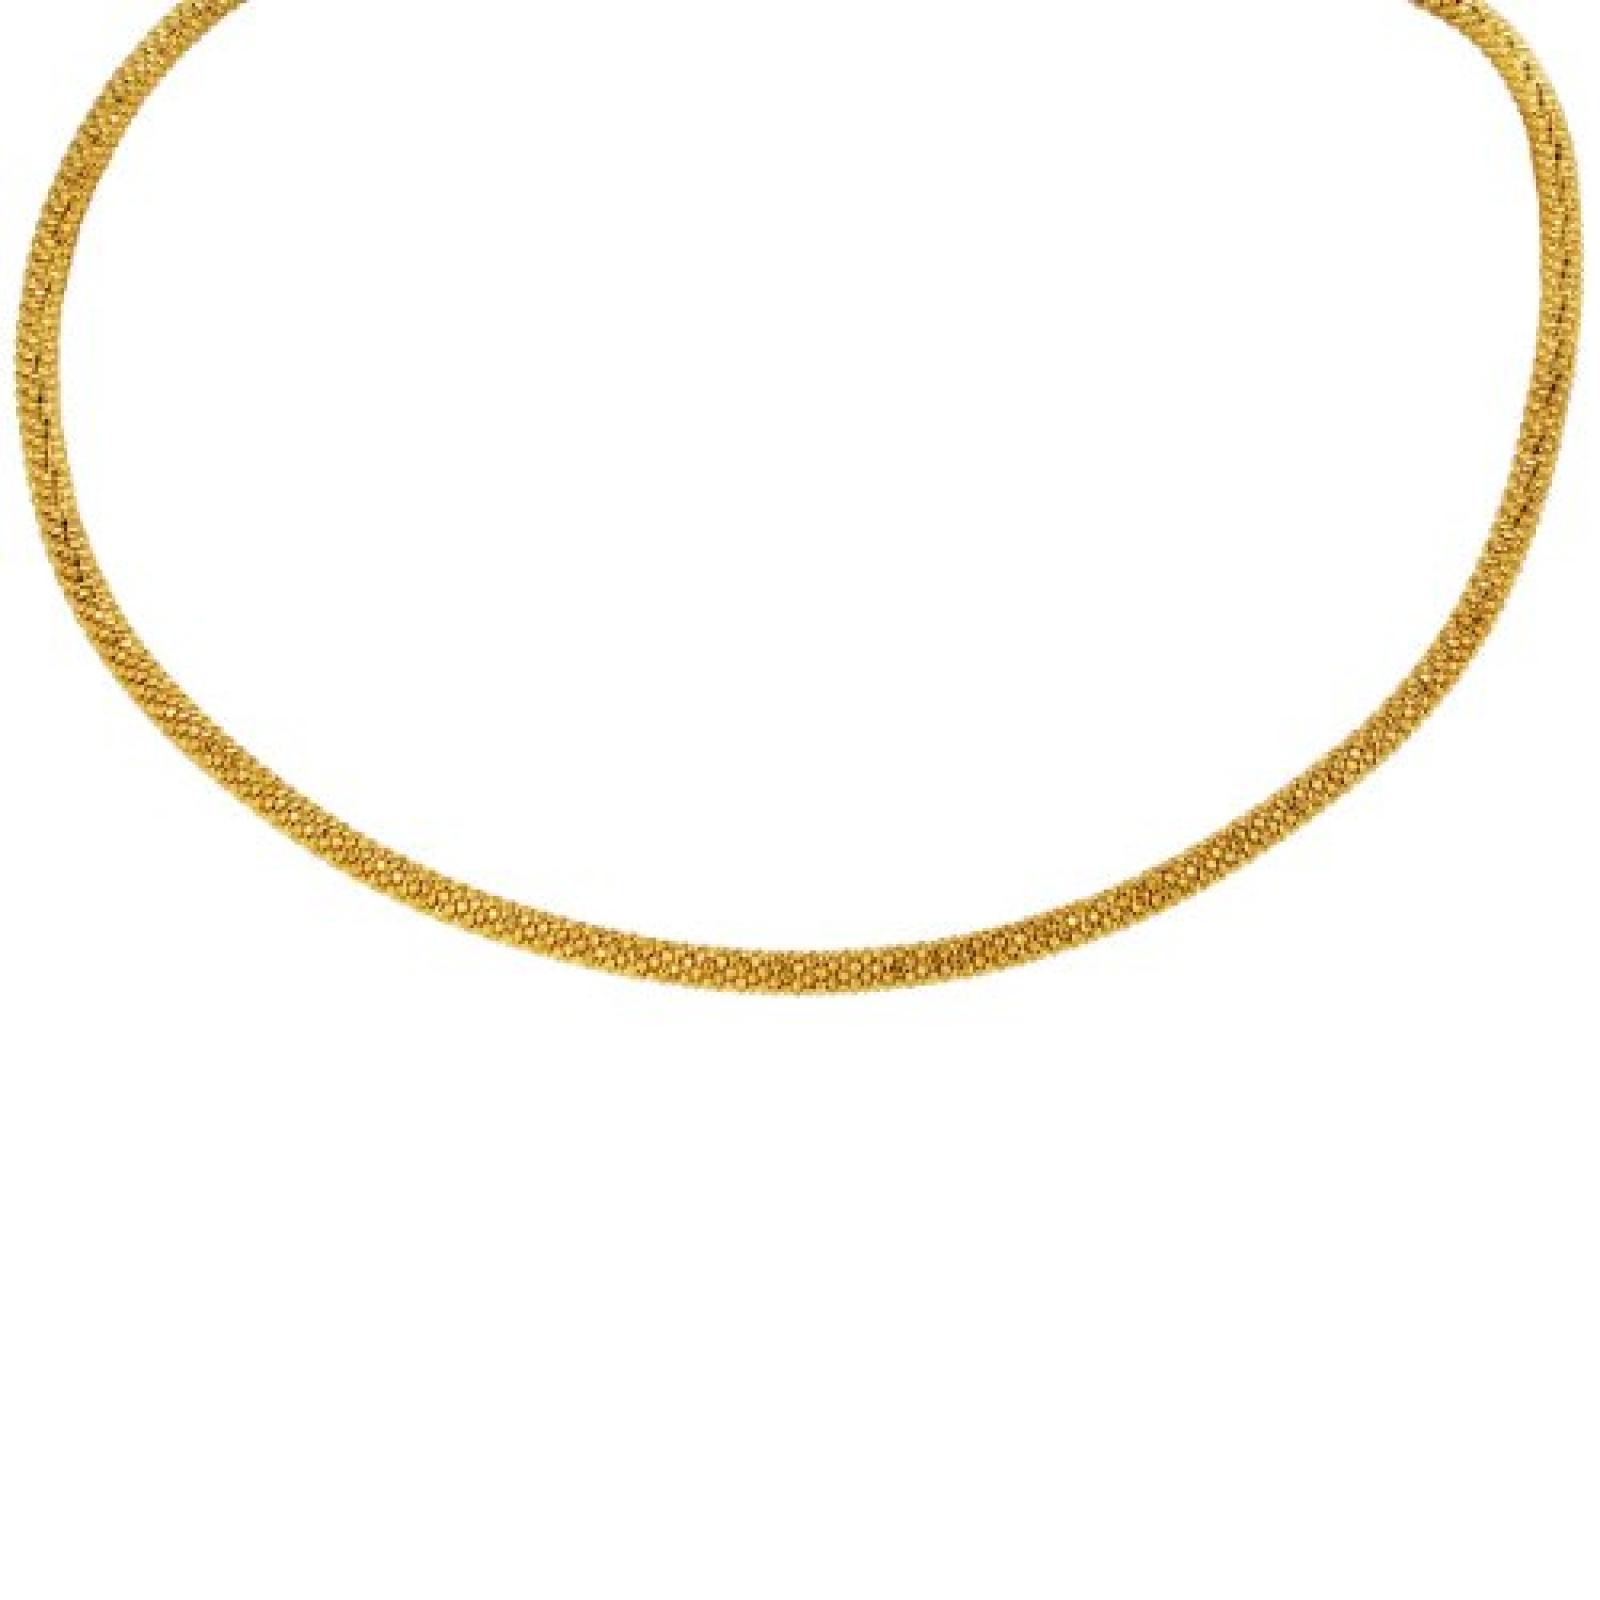 Bella Donna Damen Halskette 925 Sterling Silber 43.0 cm 61494309